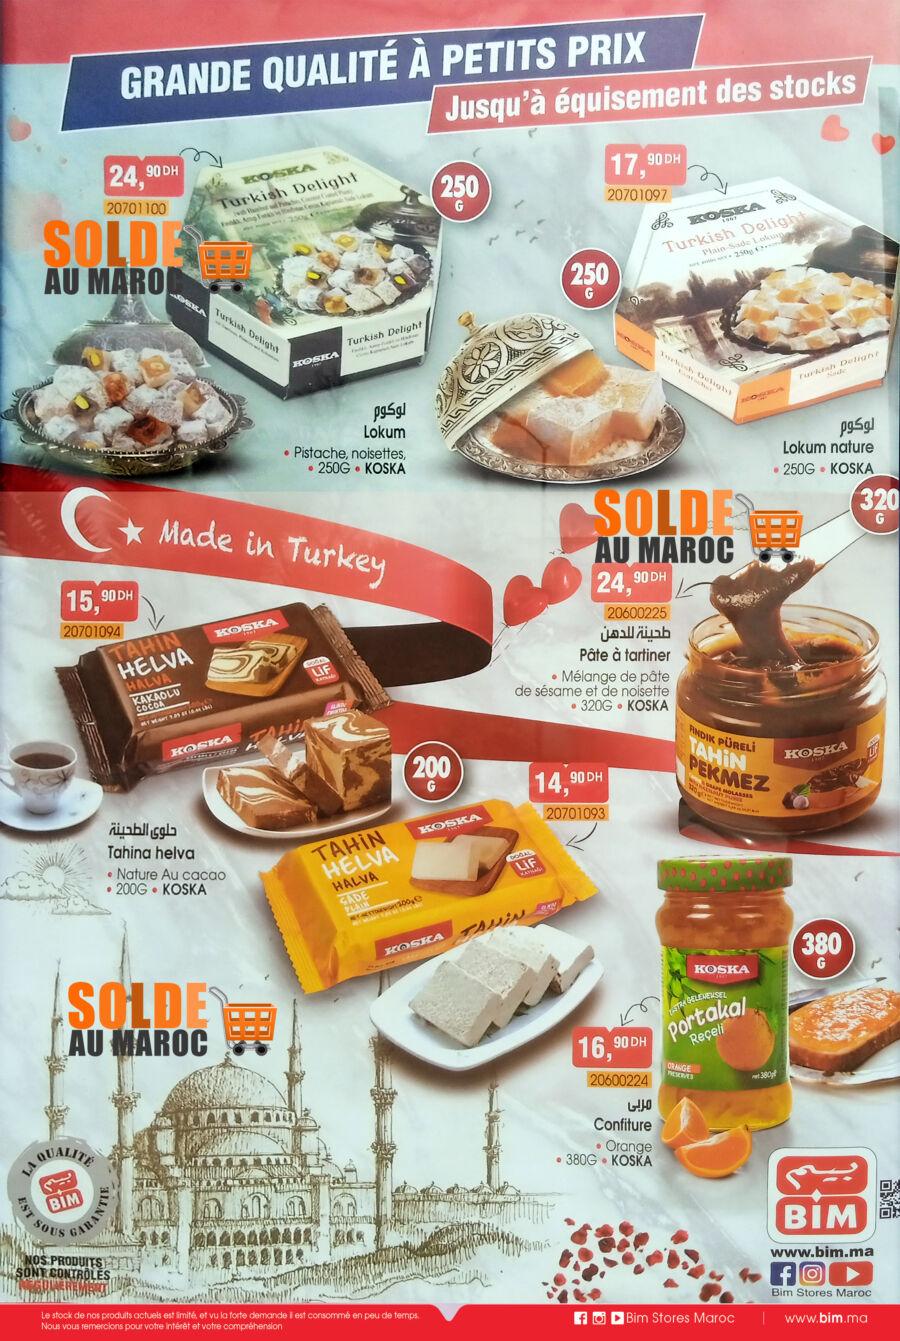 Catalogue Bim Maroc Spéciale Made in Turkey Jusqu'à équisement des Stocks